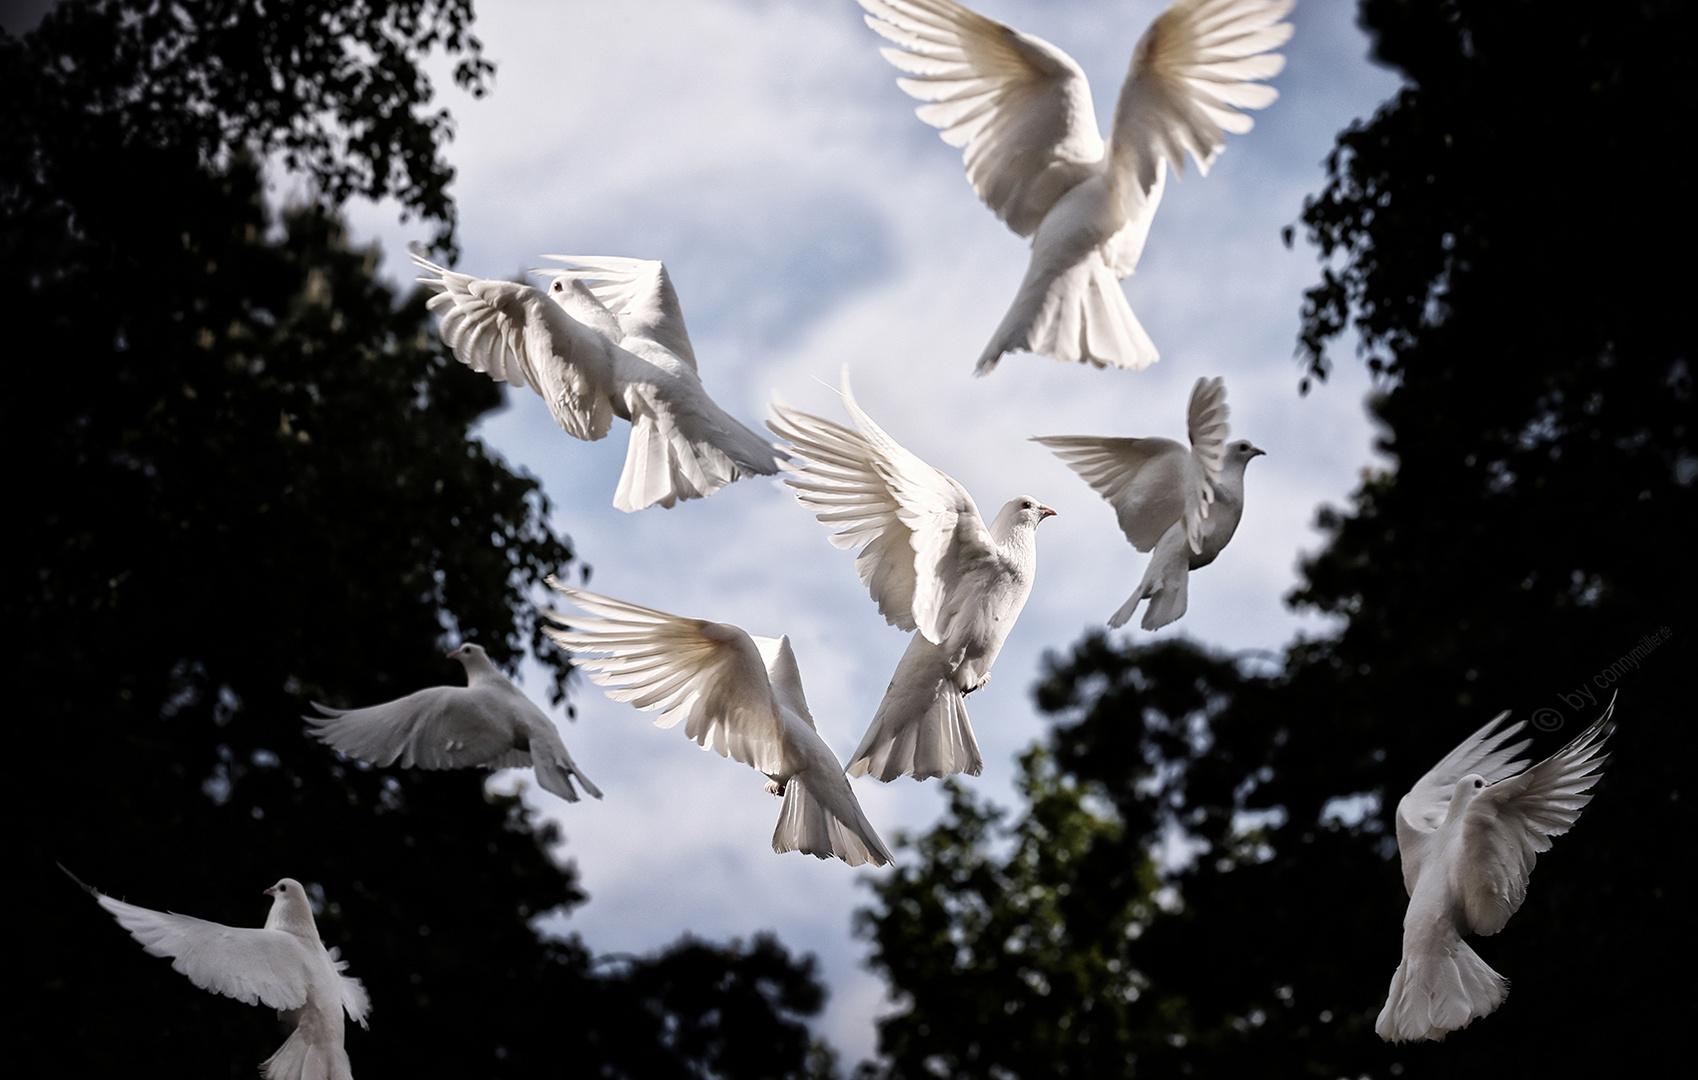 Pigeons are better for safer letter